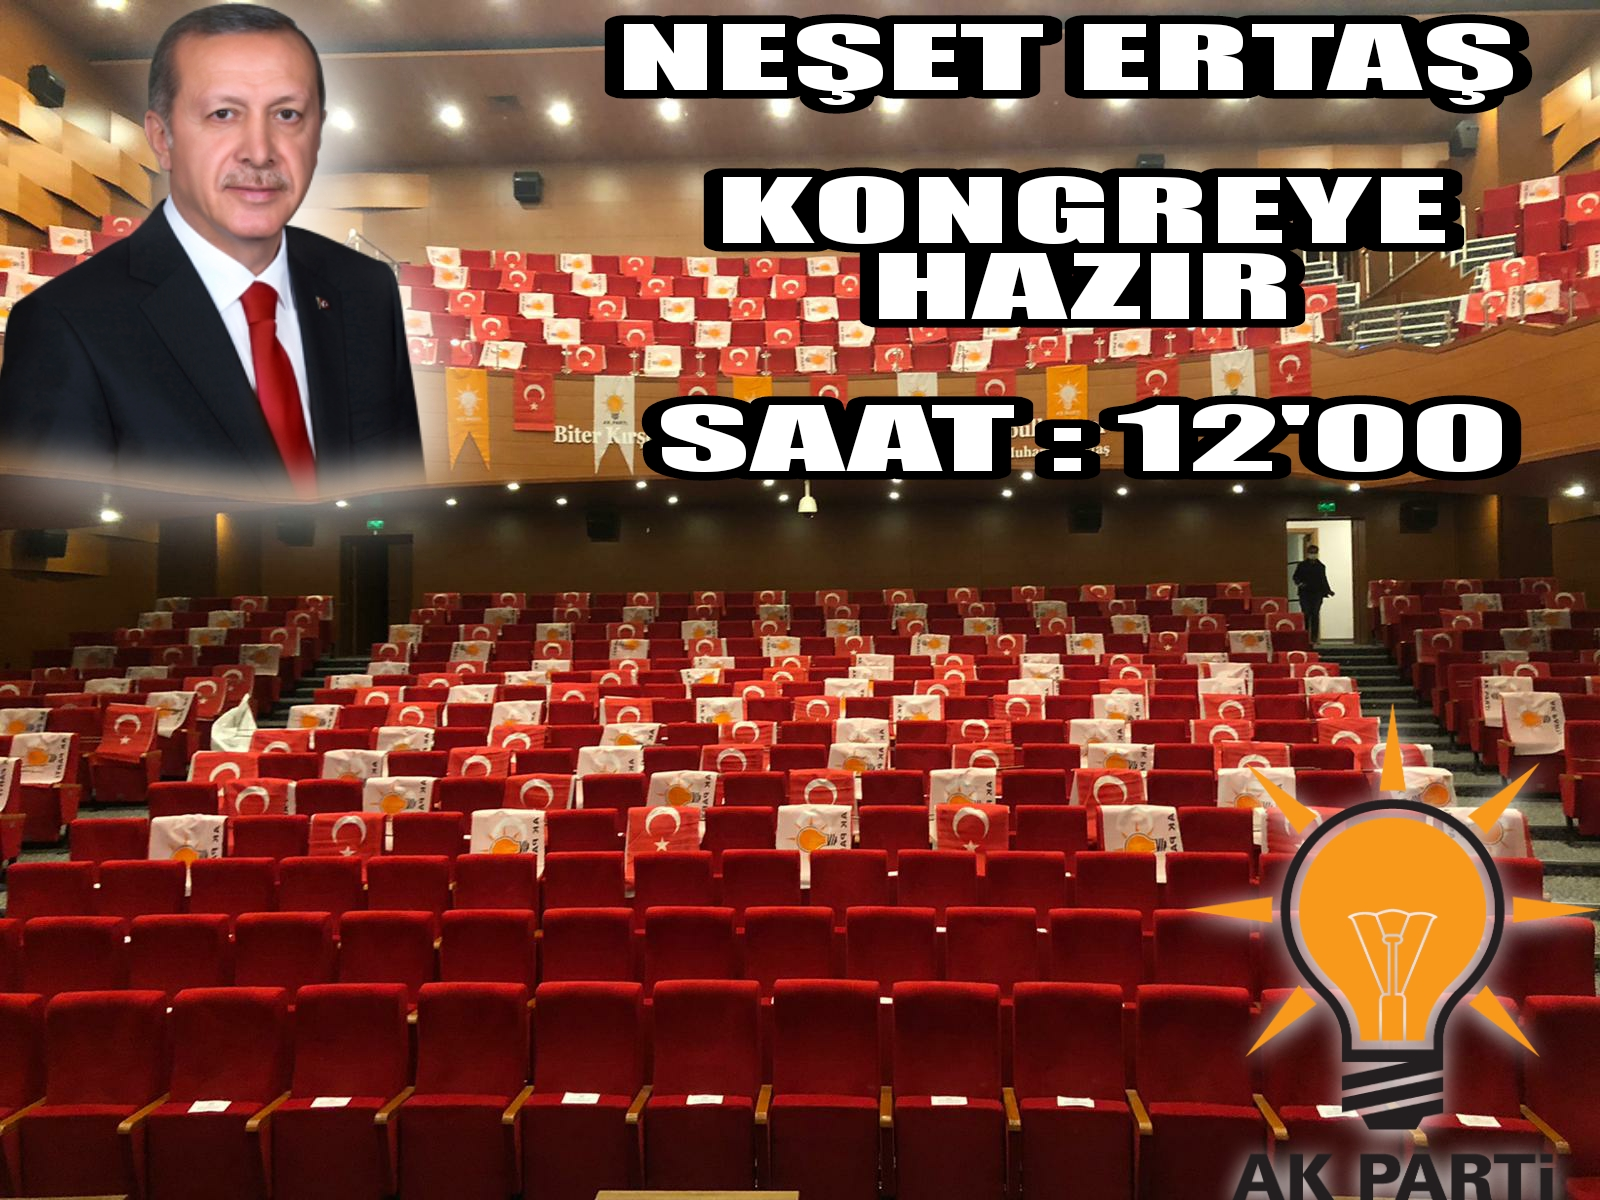 NEŞET ERTAŞ KÜLTÜR MERKEZİ HAZIR !!